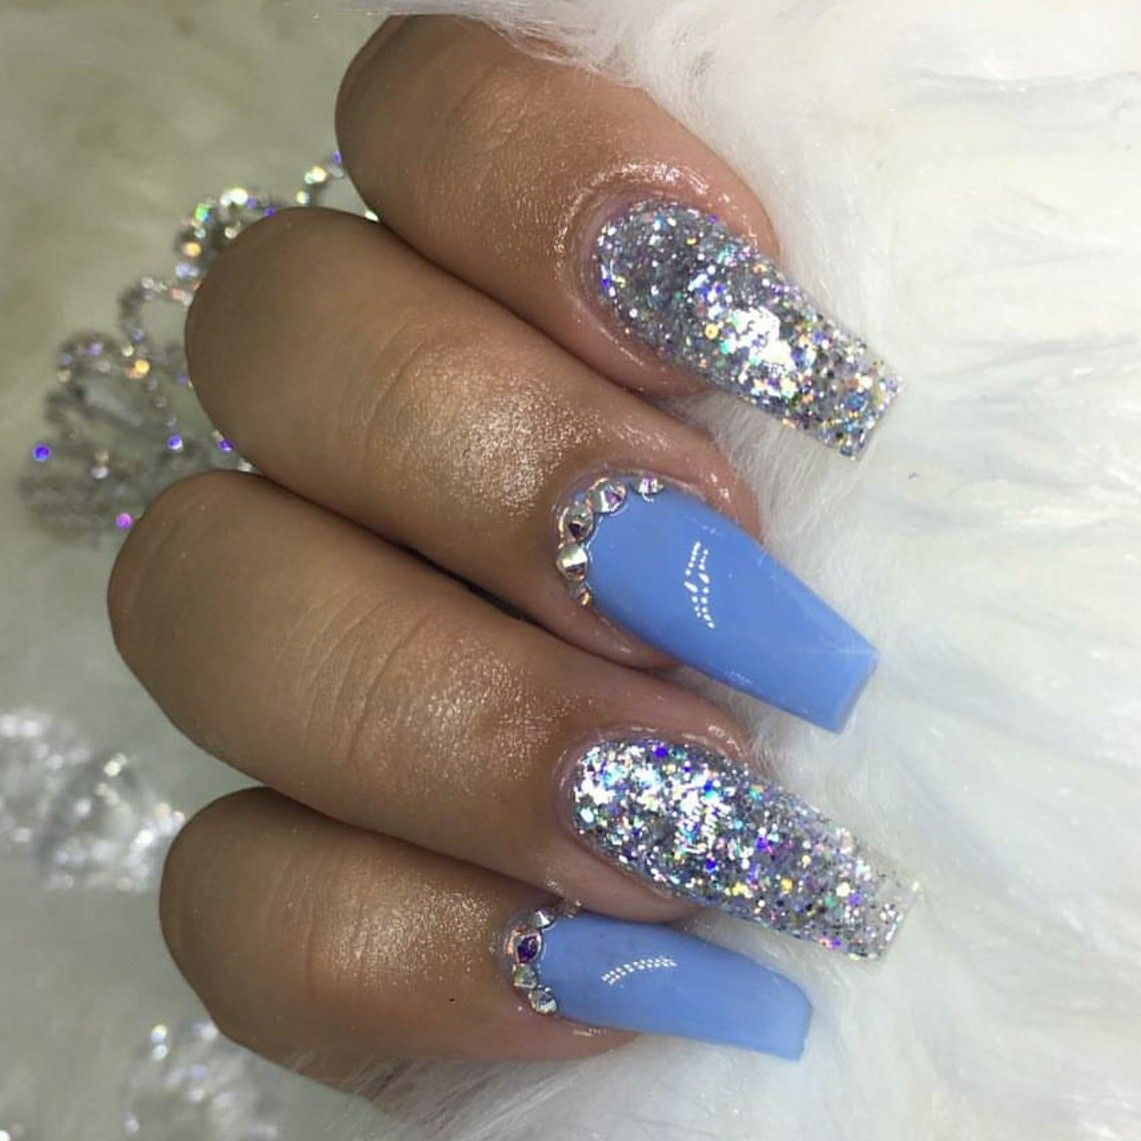 Glitter Blue acrylic nails best photo